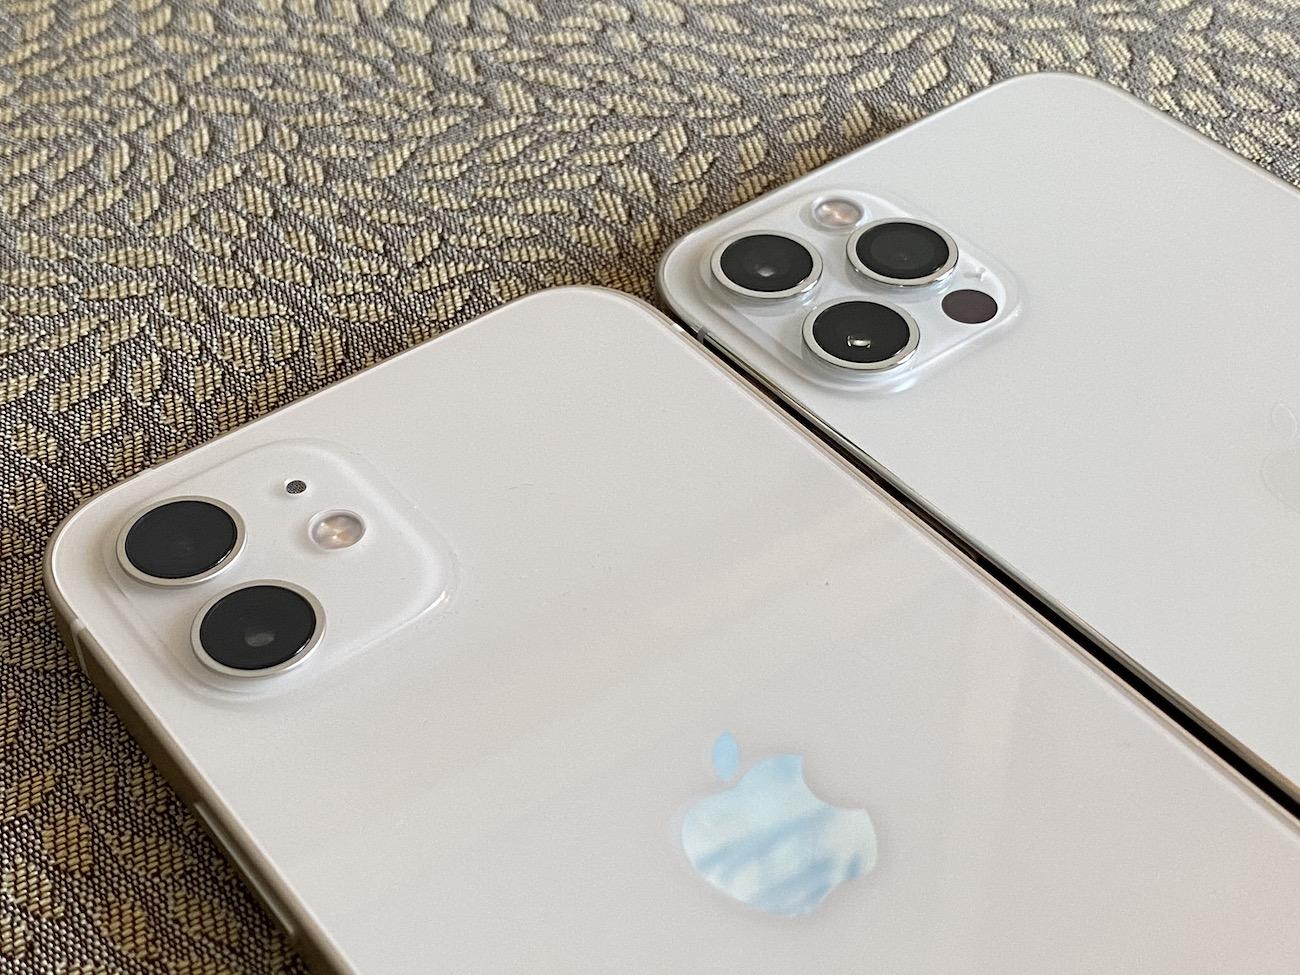 iPhone 12 12pro カメラ 比較